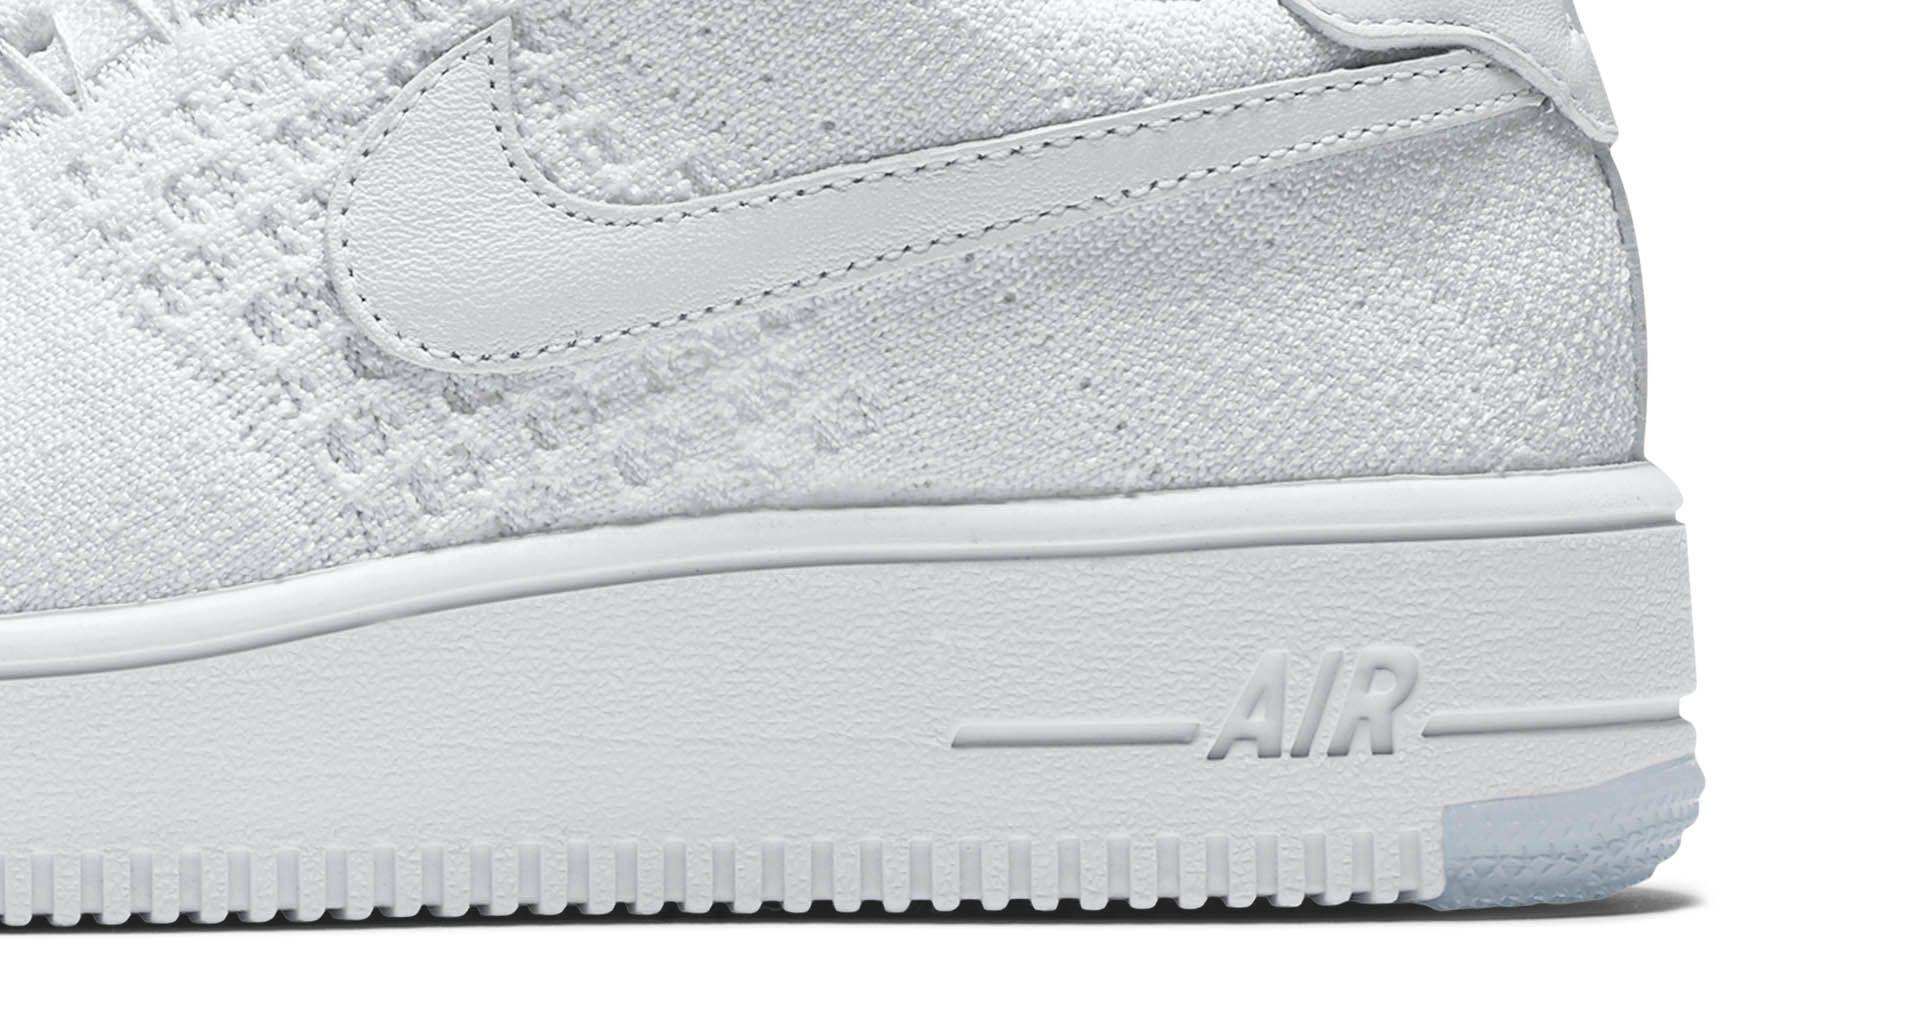 sale retailer 0861d a4562 Women's Nike Air Force 1 Ultra Flyknit Low 'Triple White ...